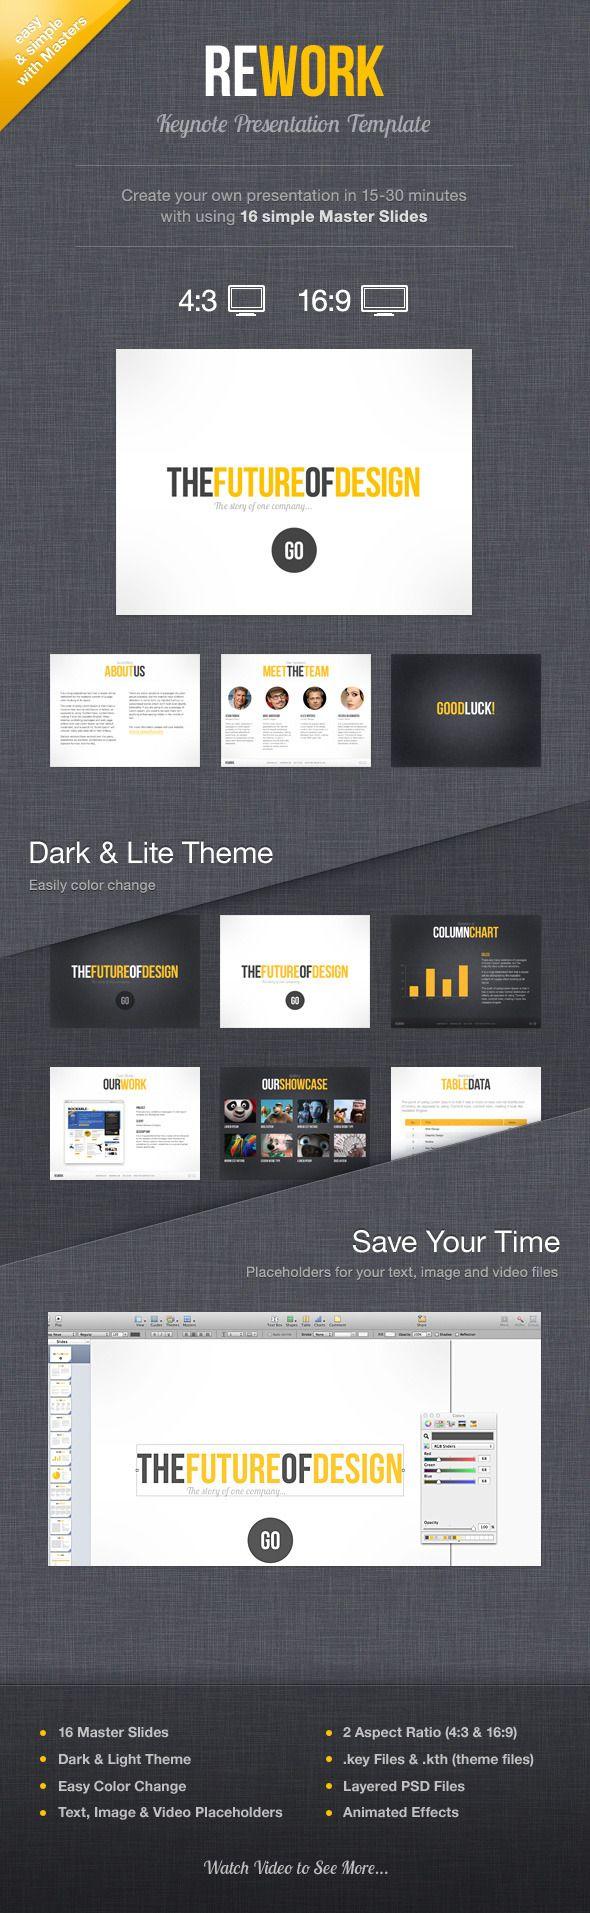 Rework Keynote Presentation Template